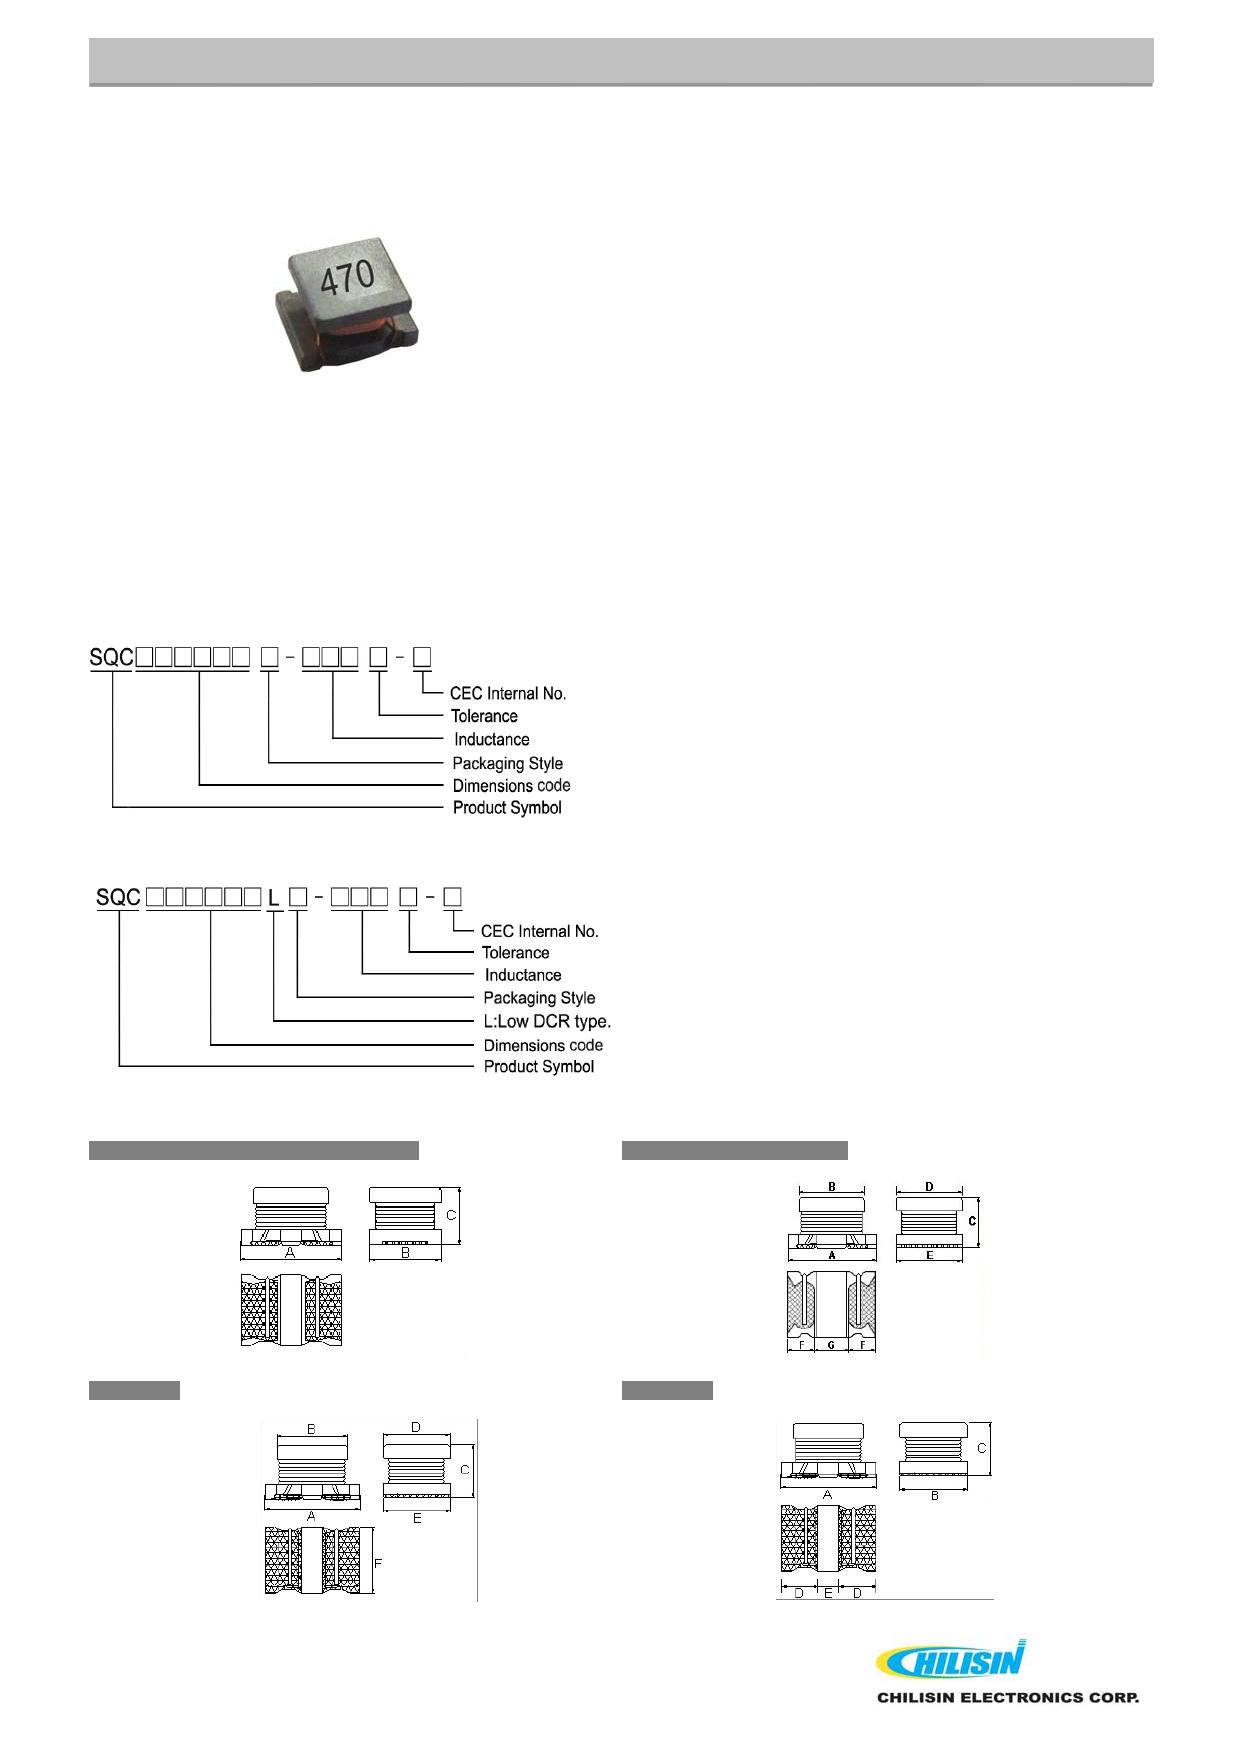 SQC322520T 데이터시트 및 SQC322520T PDF